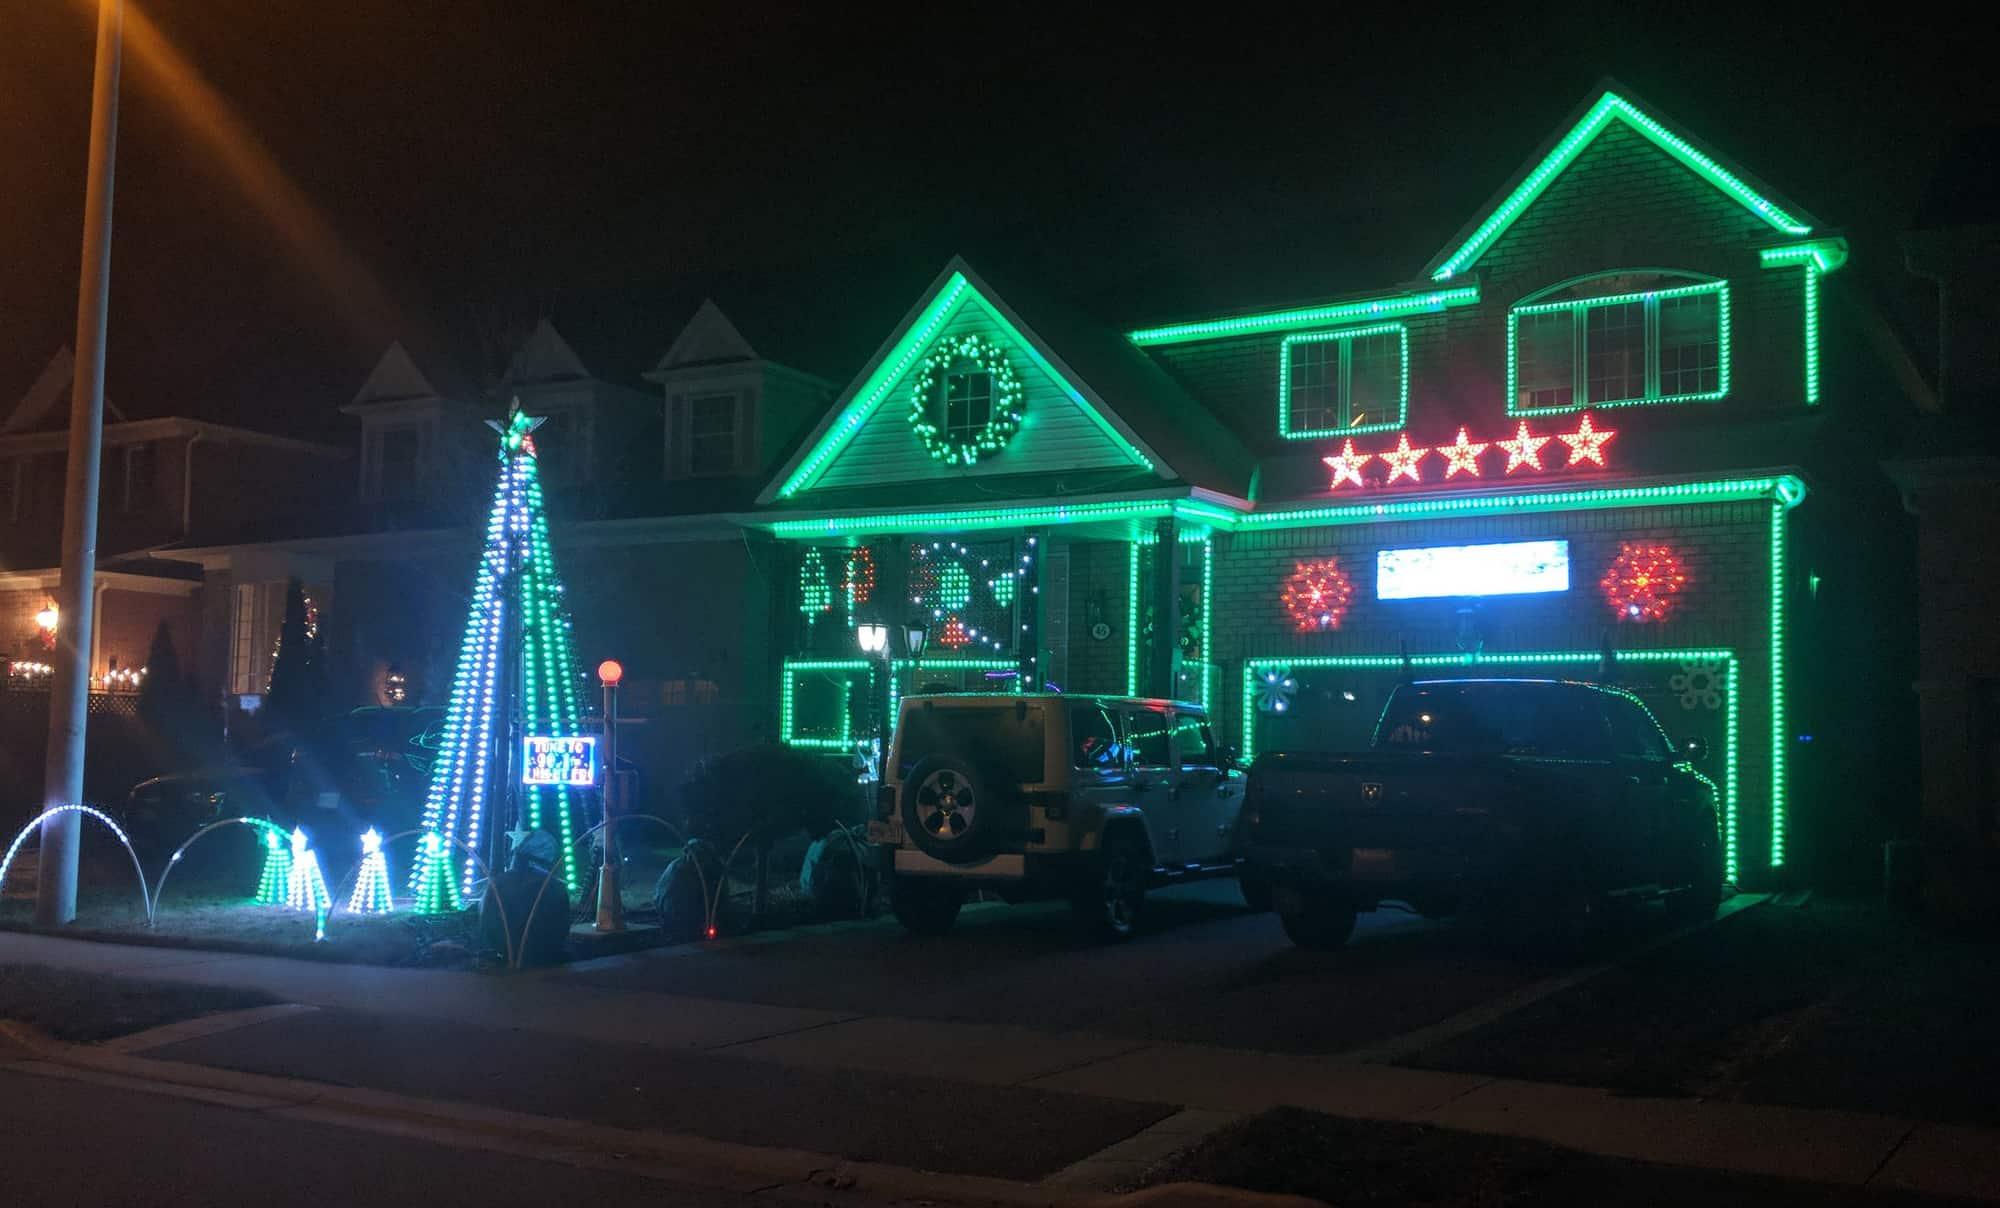 Best Christmas Light Displays in Brampton